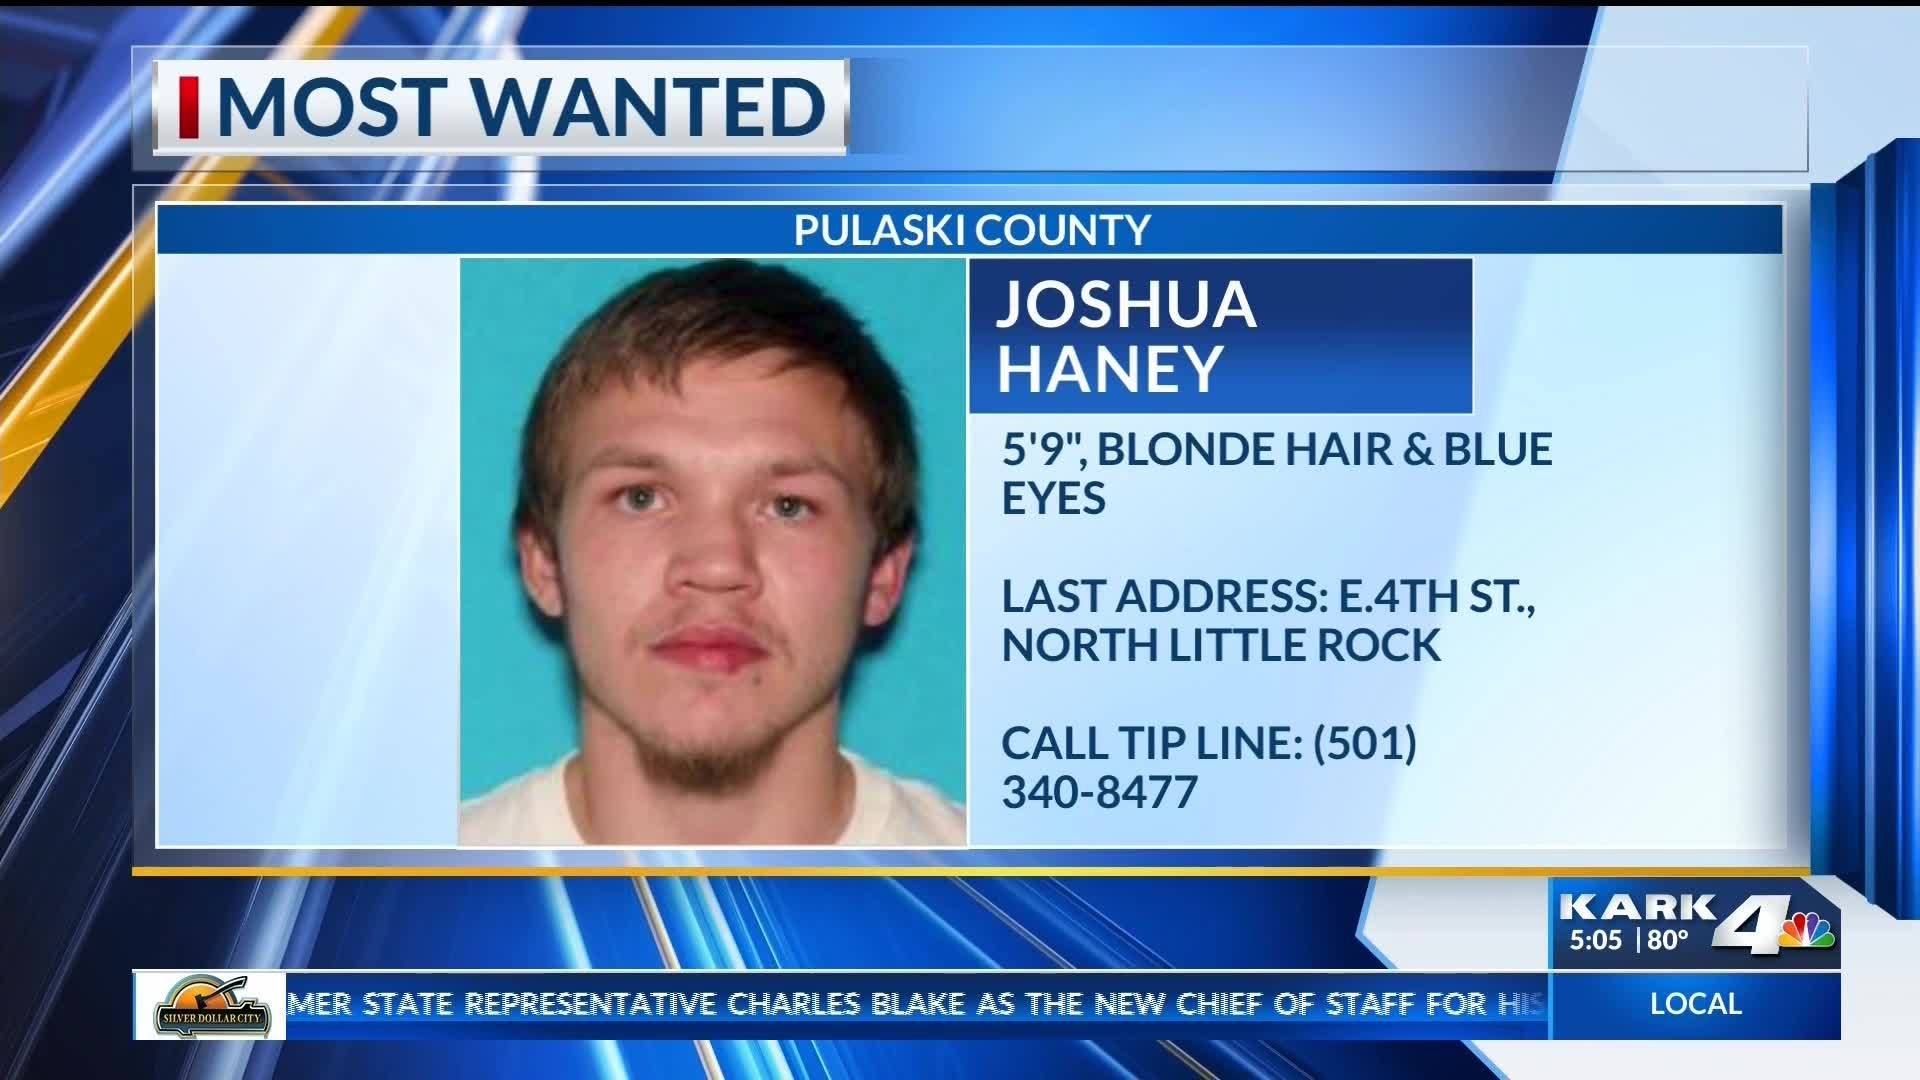 Arkansas_Most_Wanted_Joshua_Haney_8_20190519232226